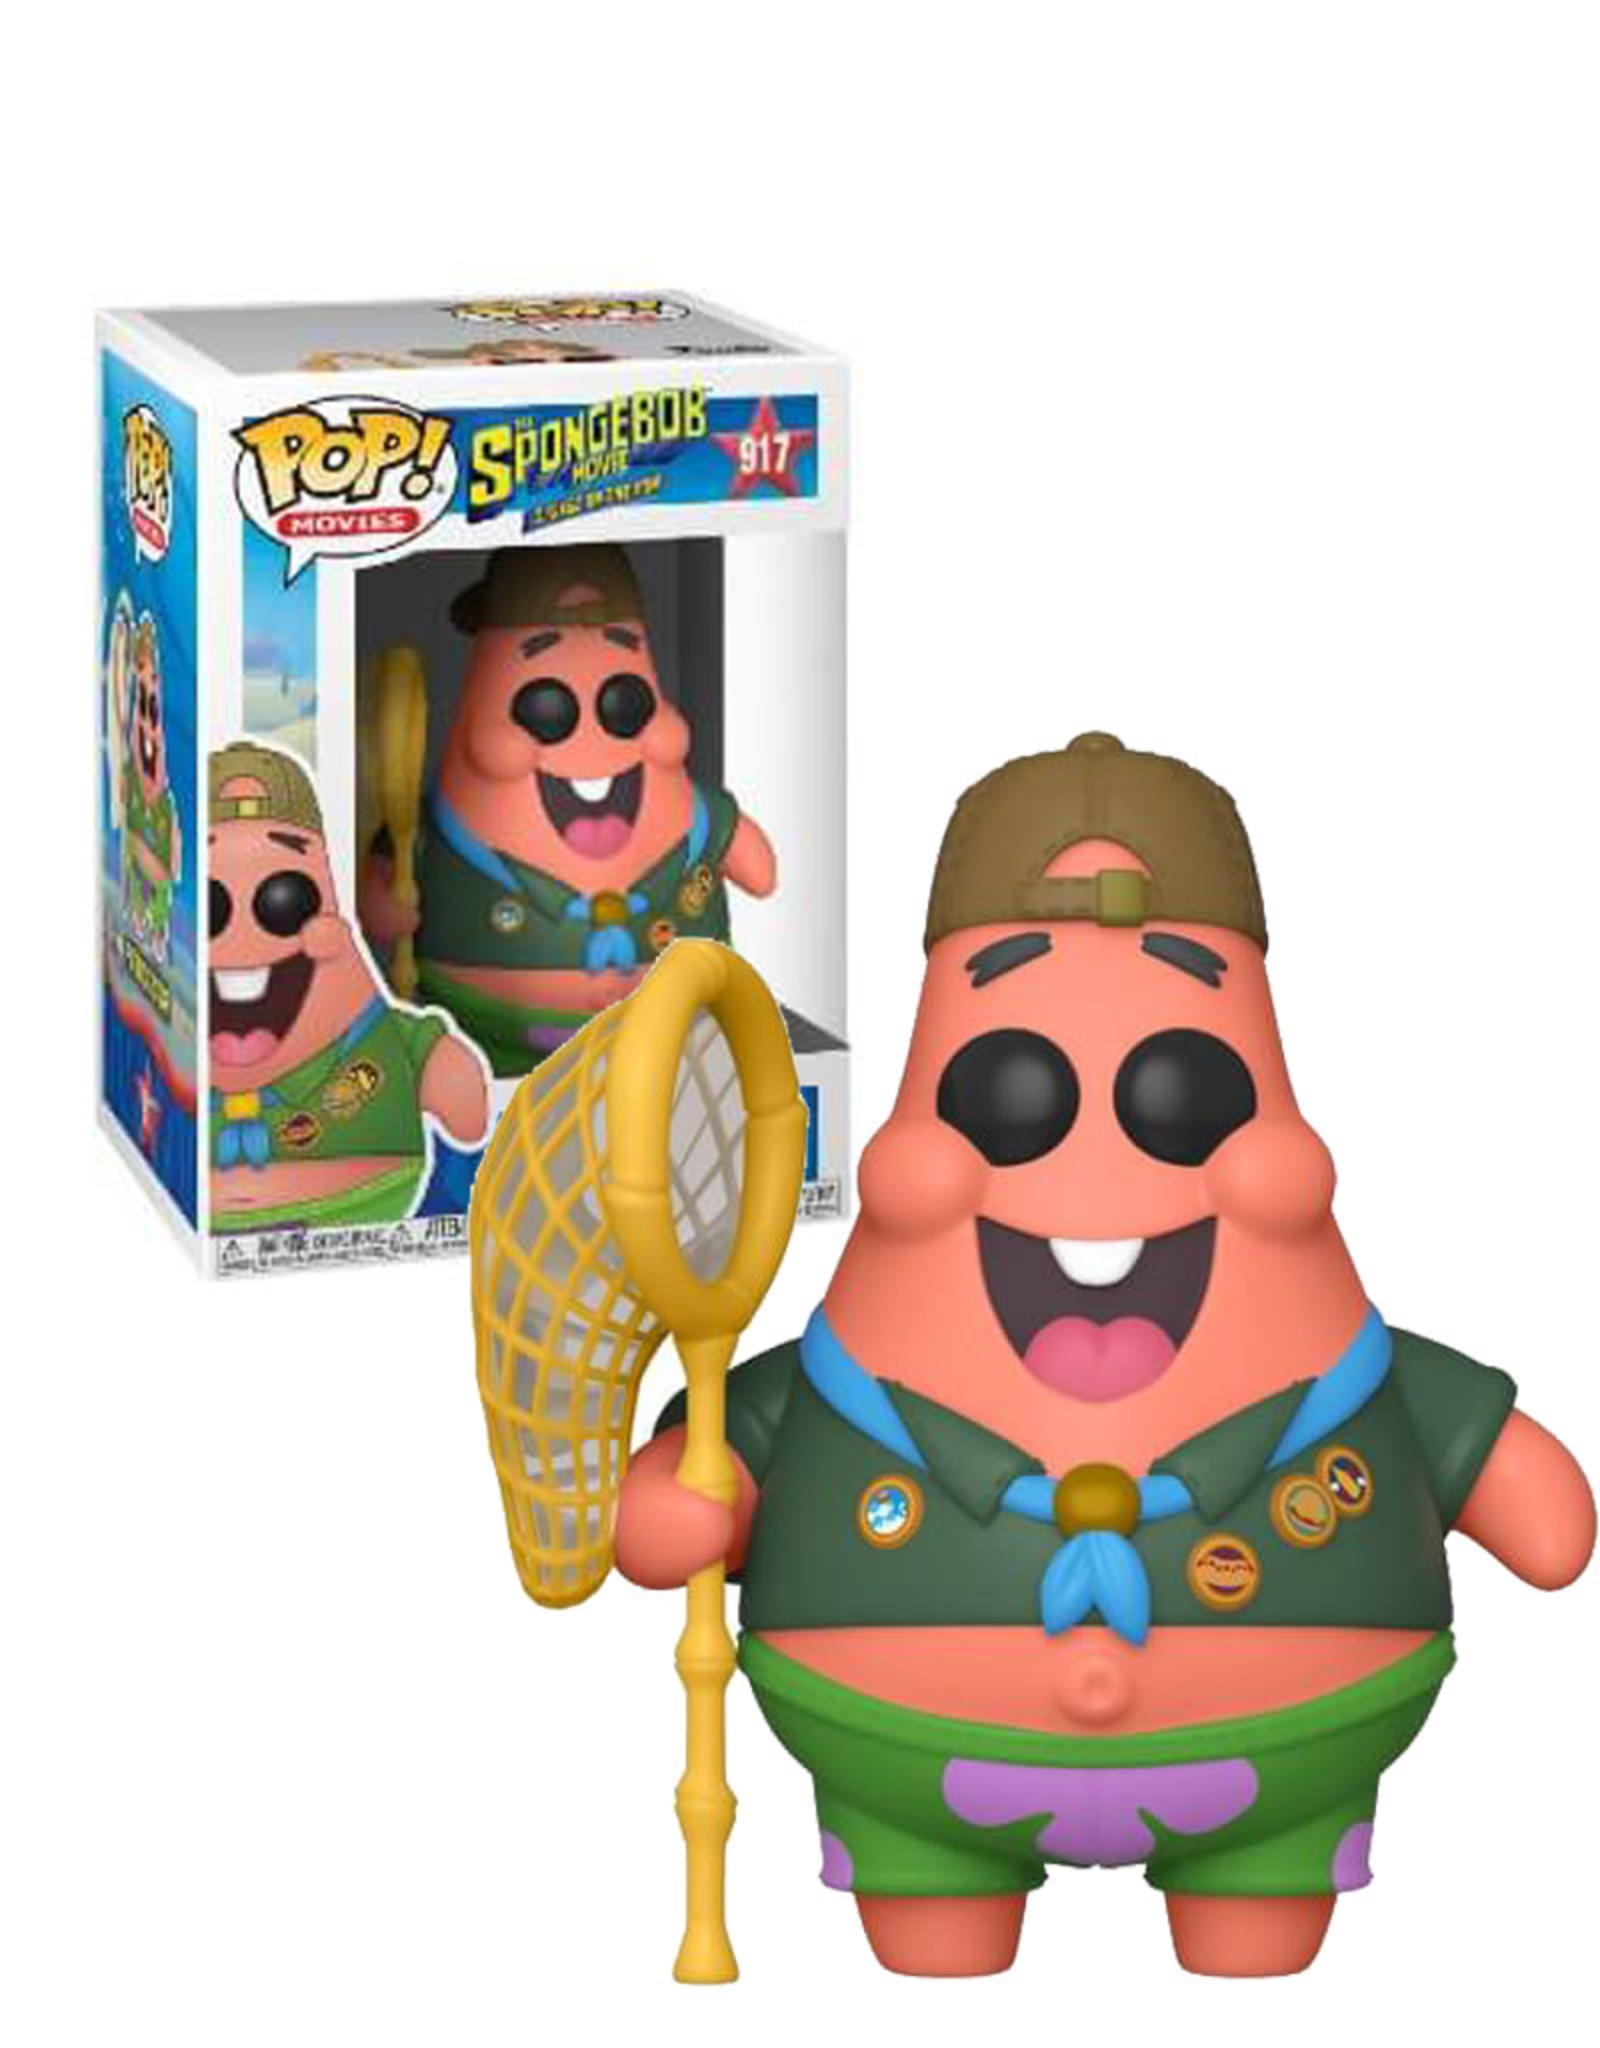 Patrick Star 917 ( Funko Pop ) The Spongebob Movie